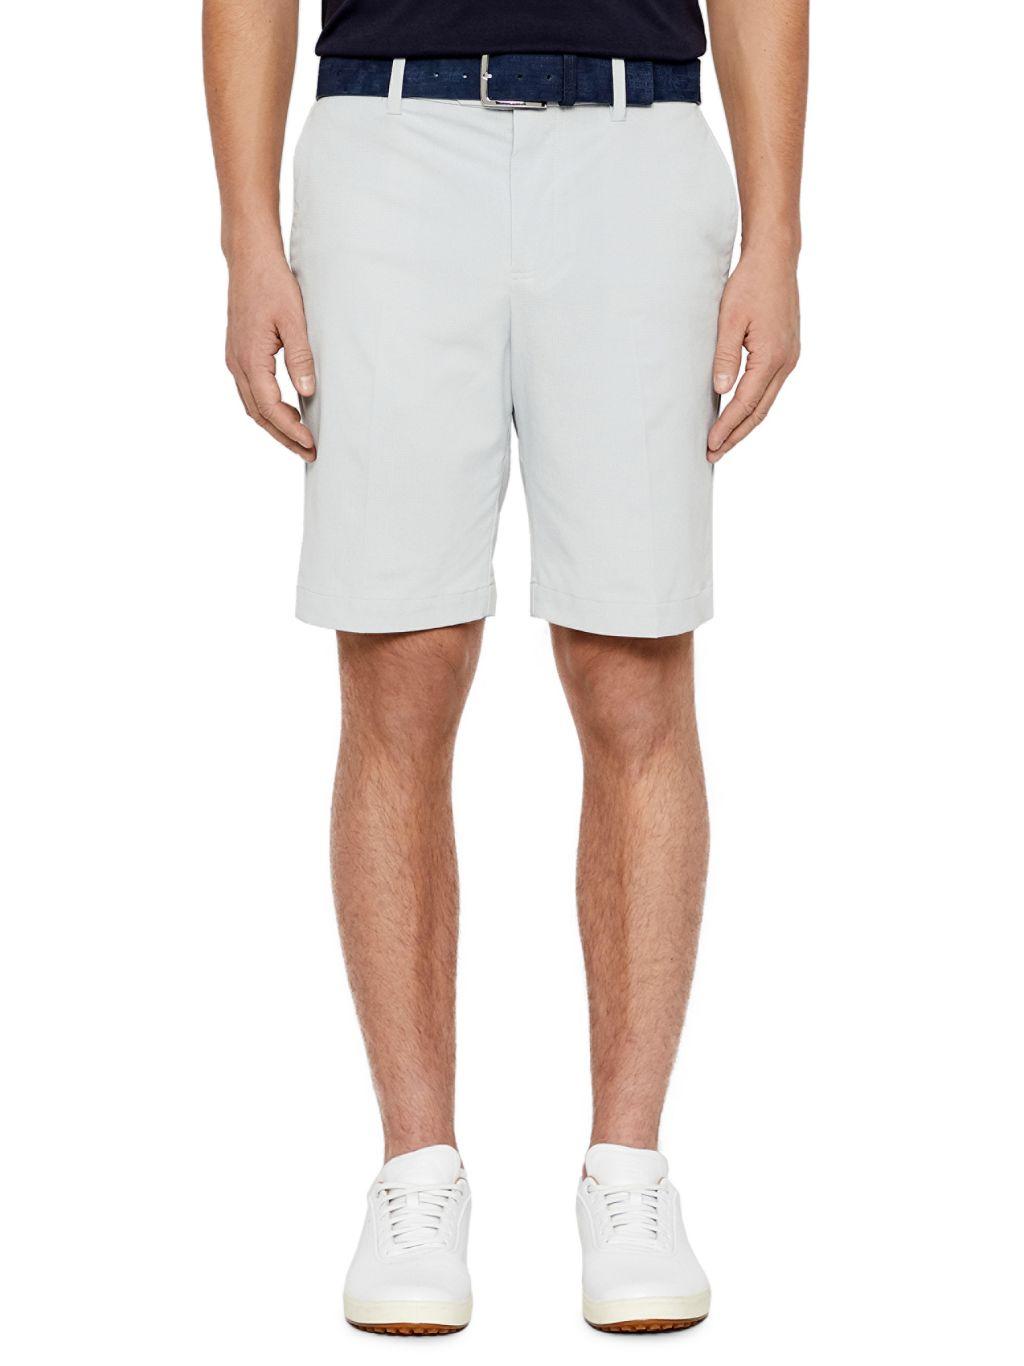 J. Lindeberg Vent Shorts